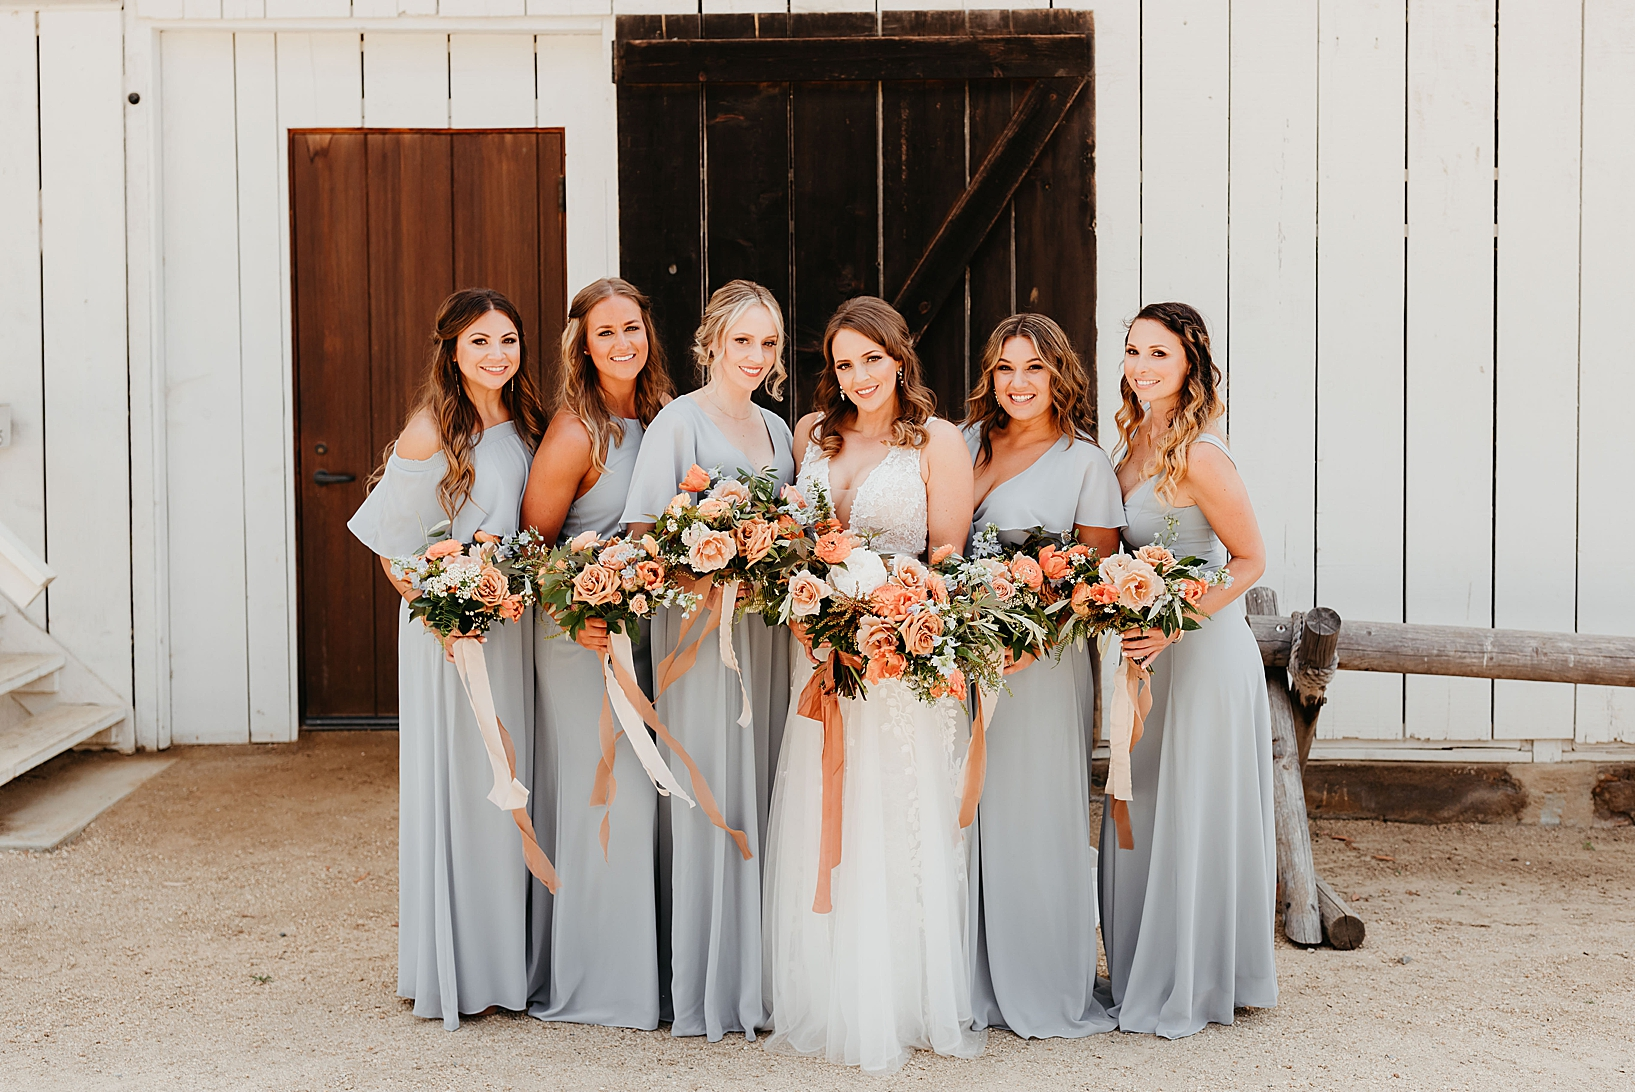 Leo-Carrillo-Ranch-Wedding-35.jpg